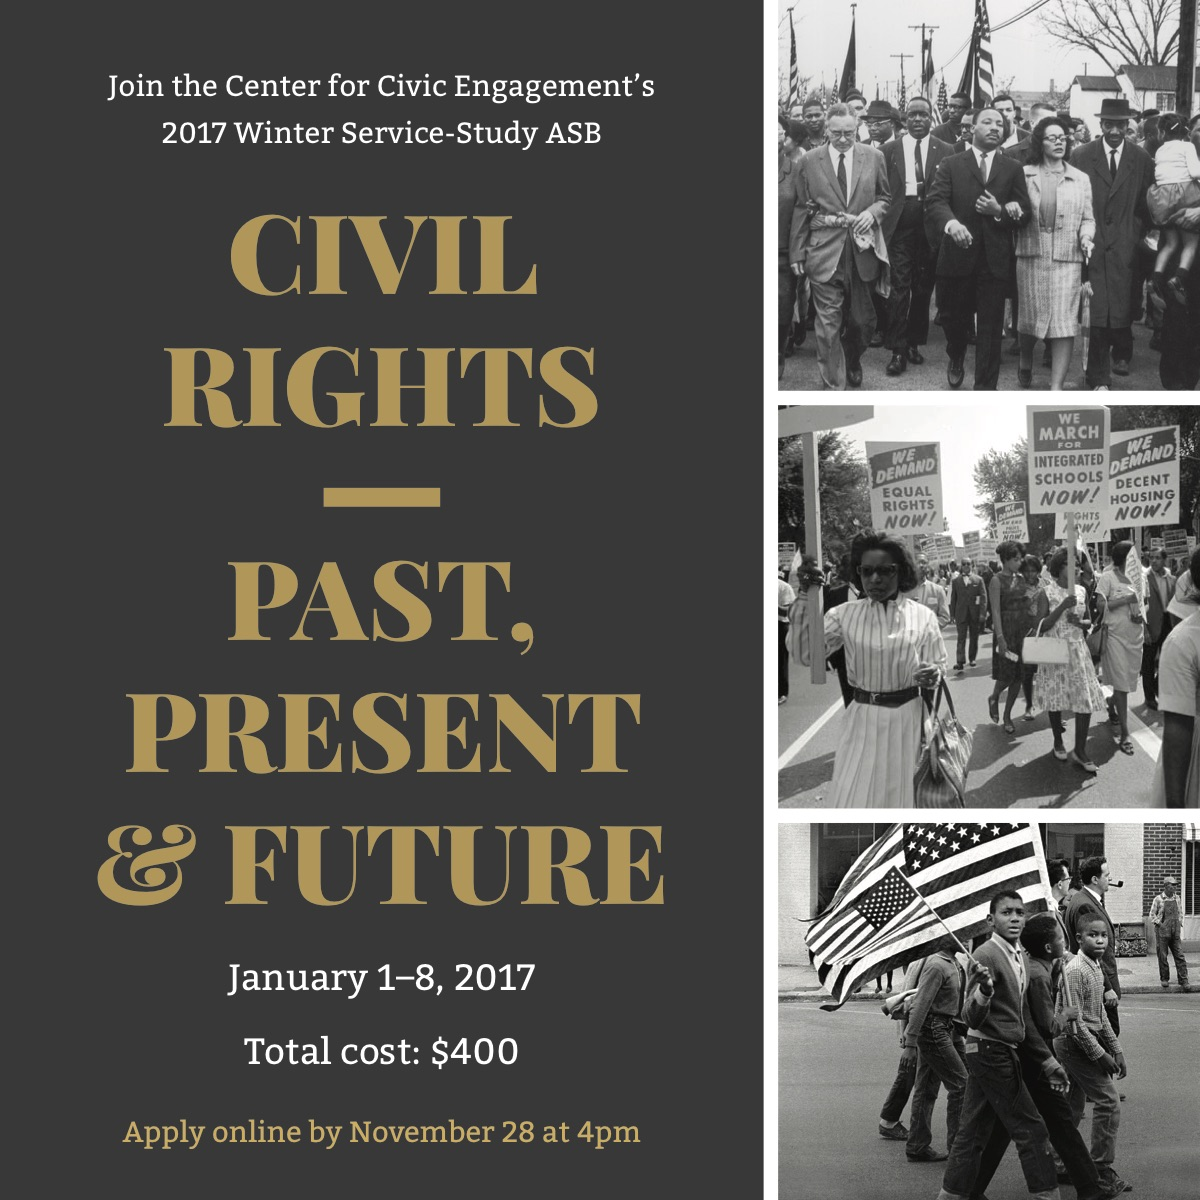 Civil Rights PPF